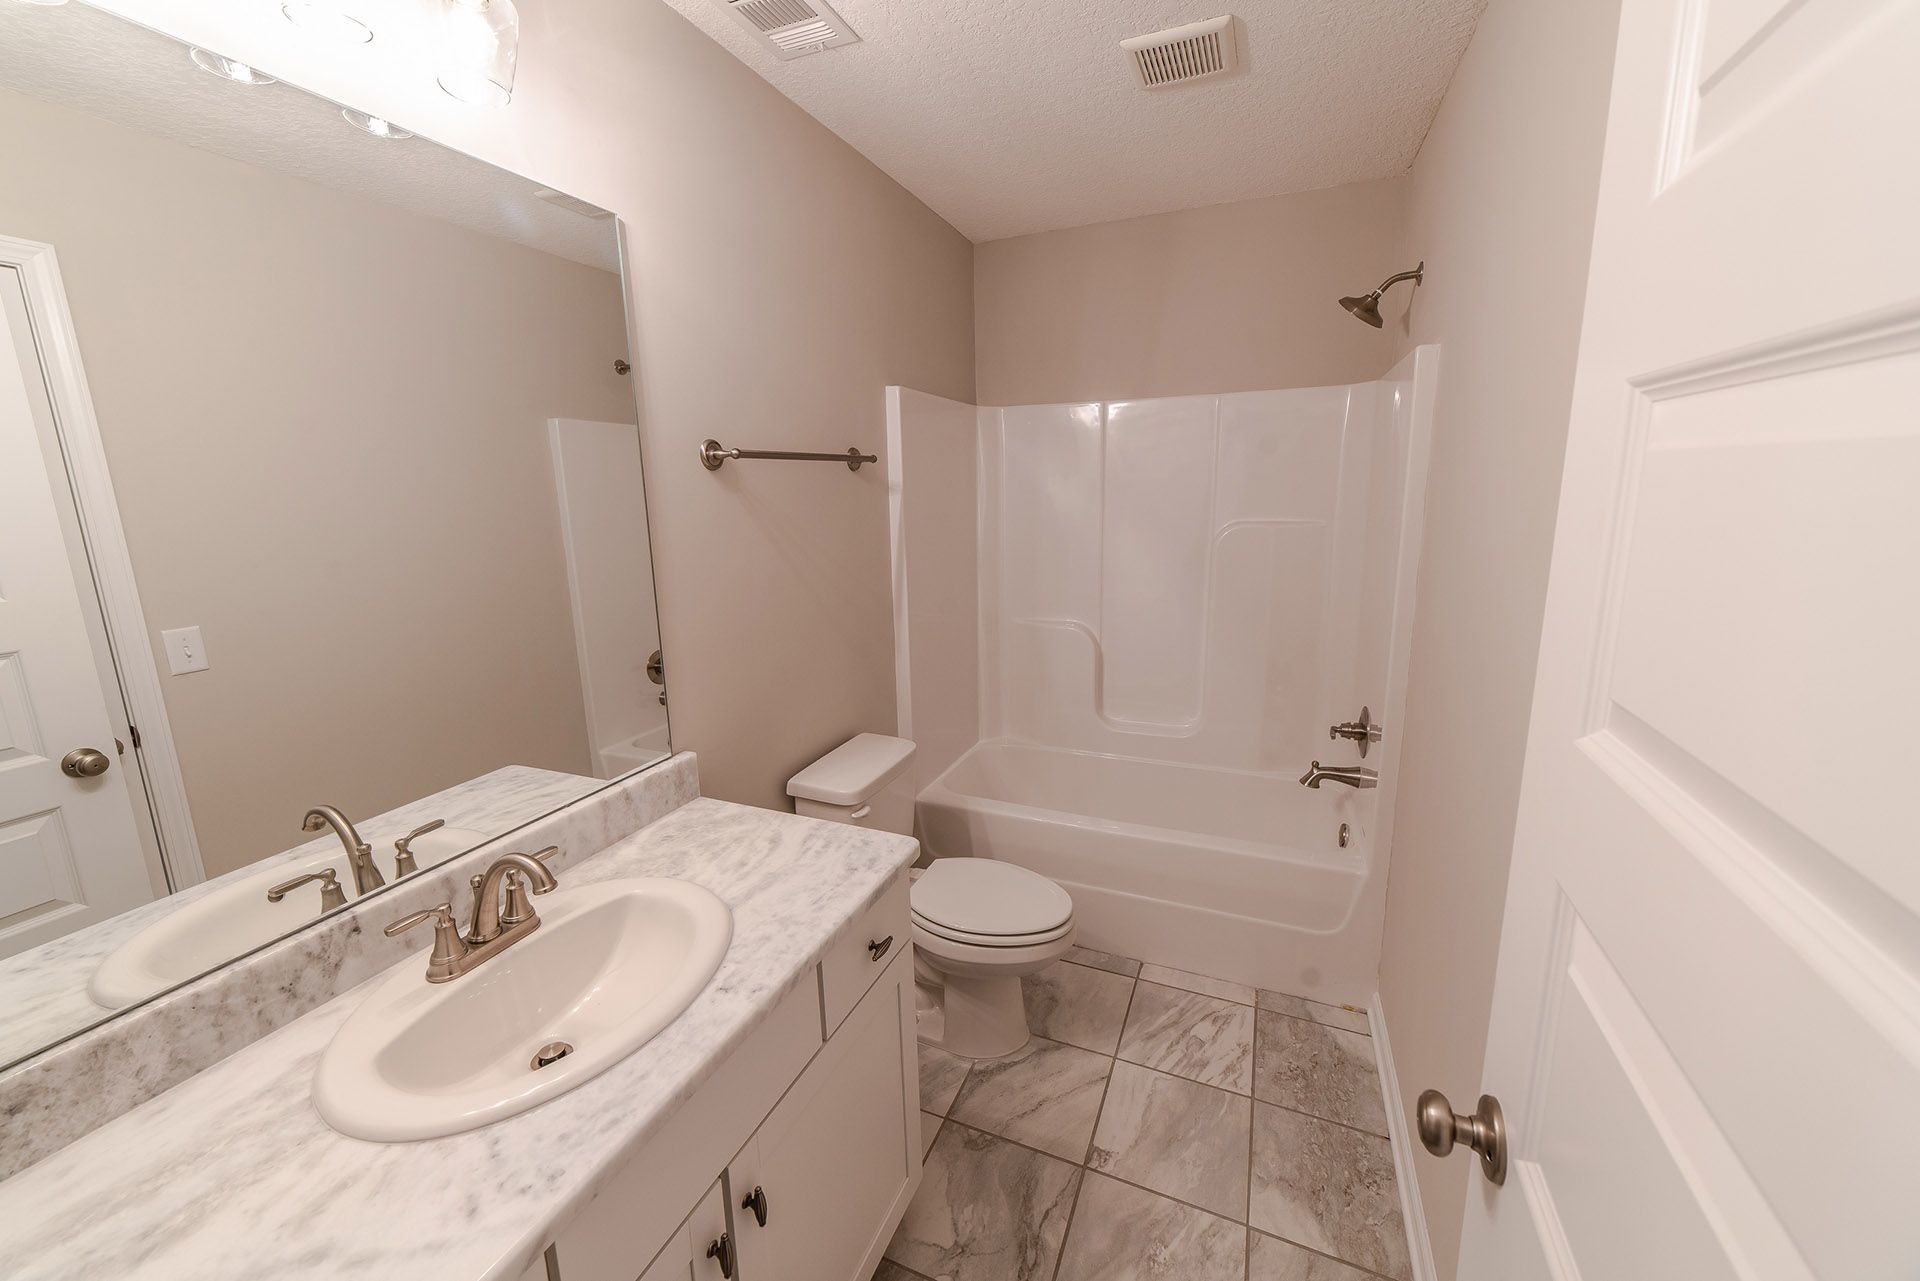 Bathroom featured in the Aspen By Grayhawk Homes in Columbus, GA